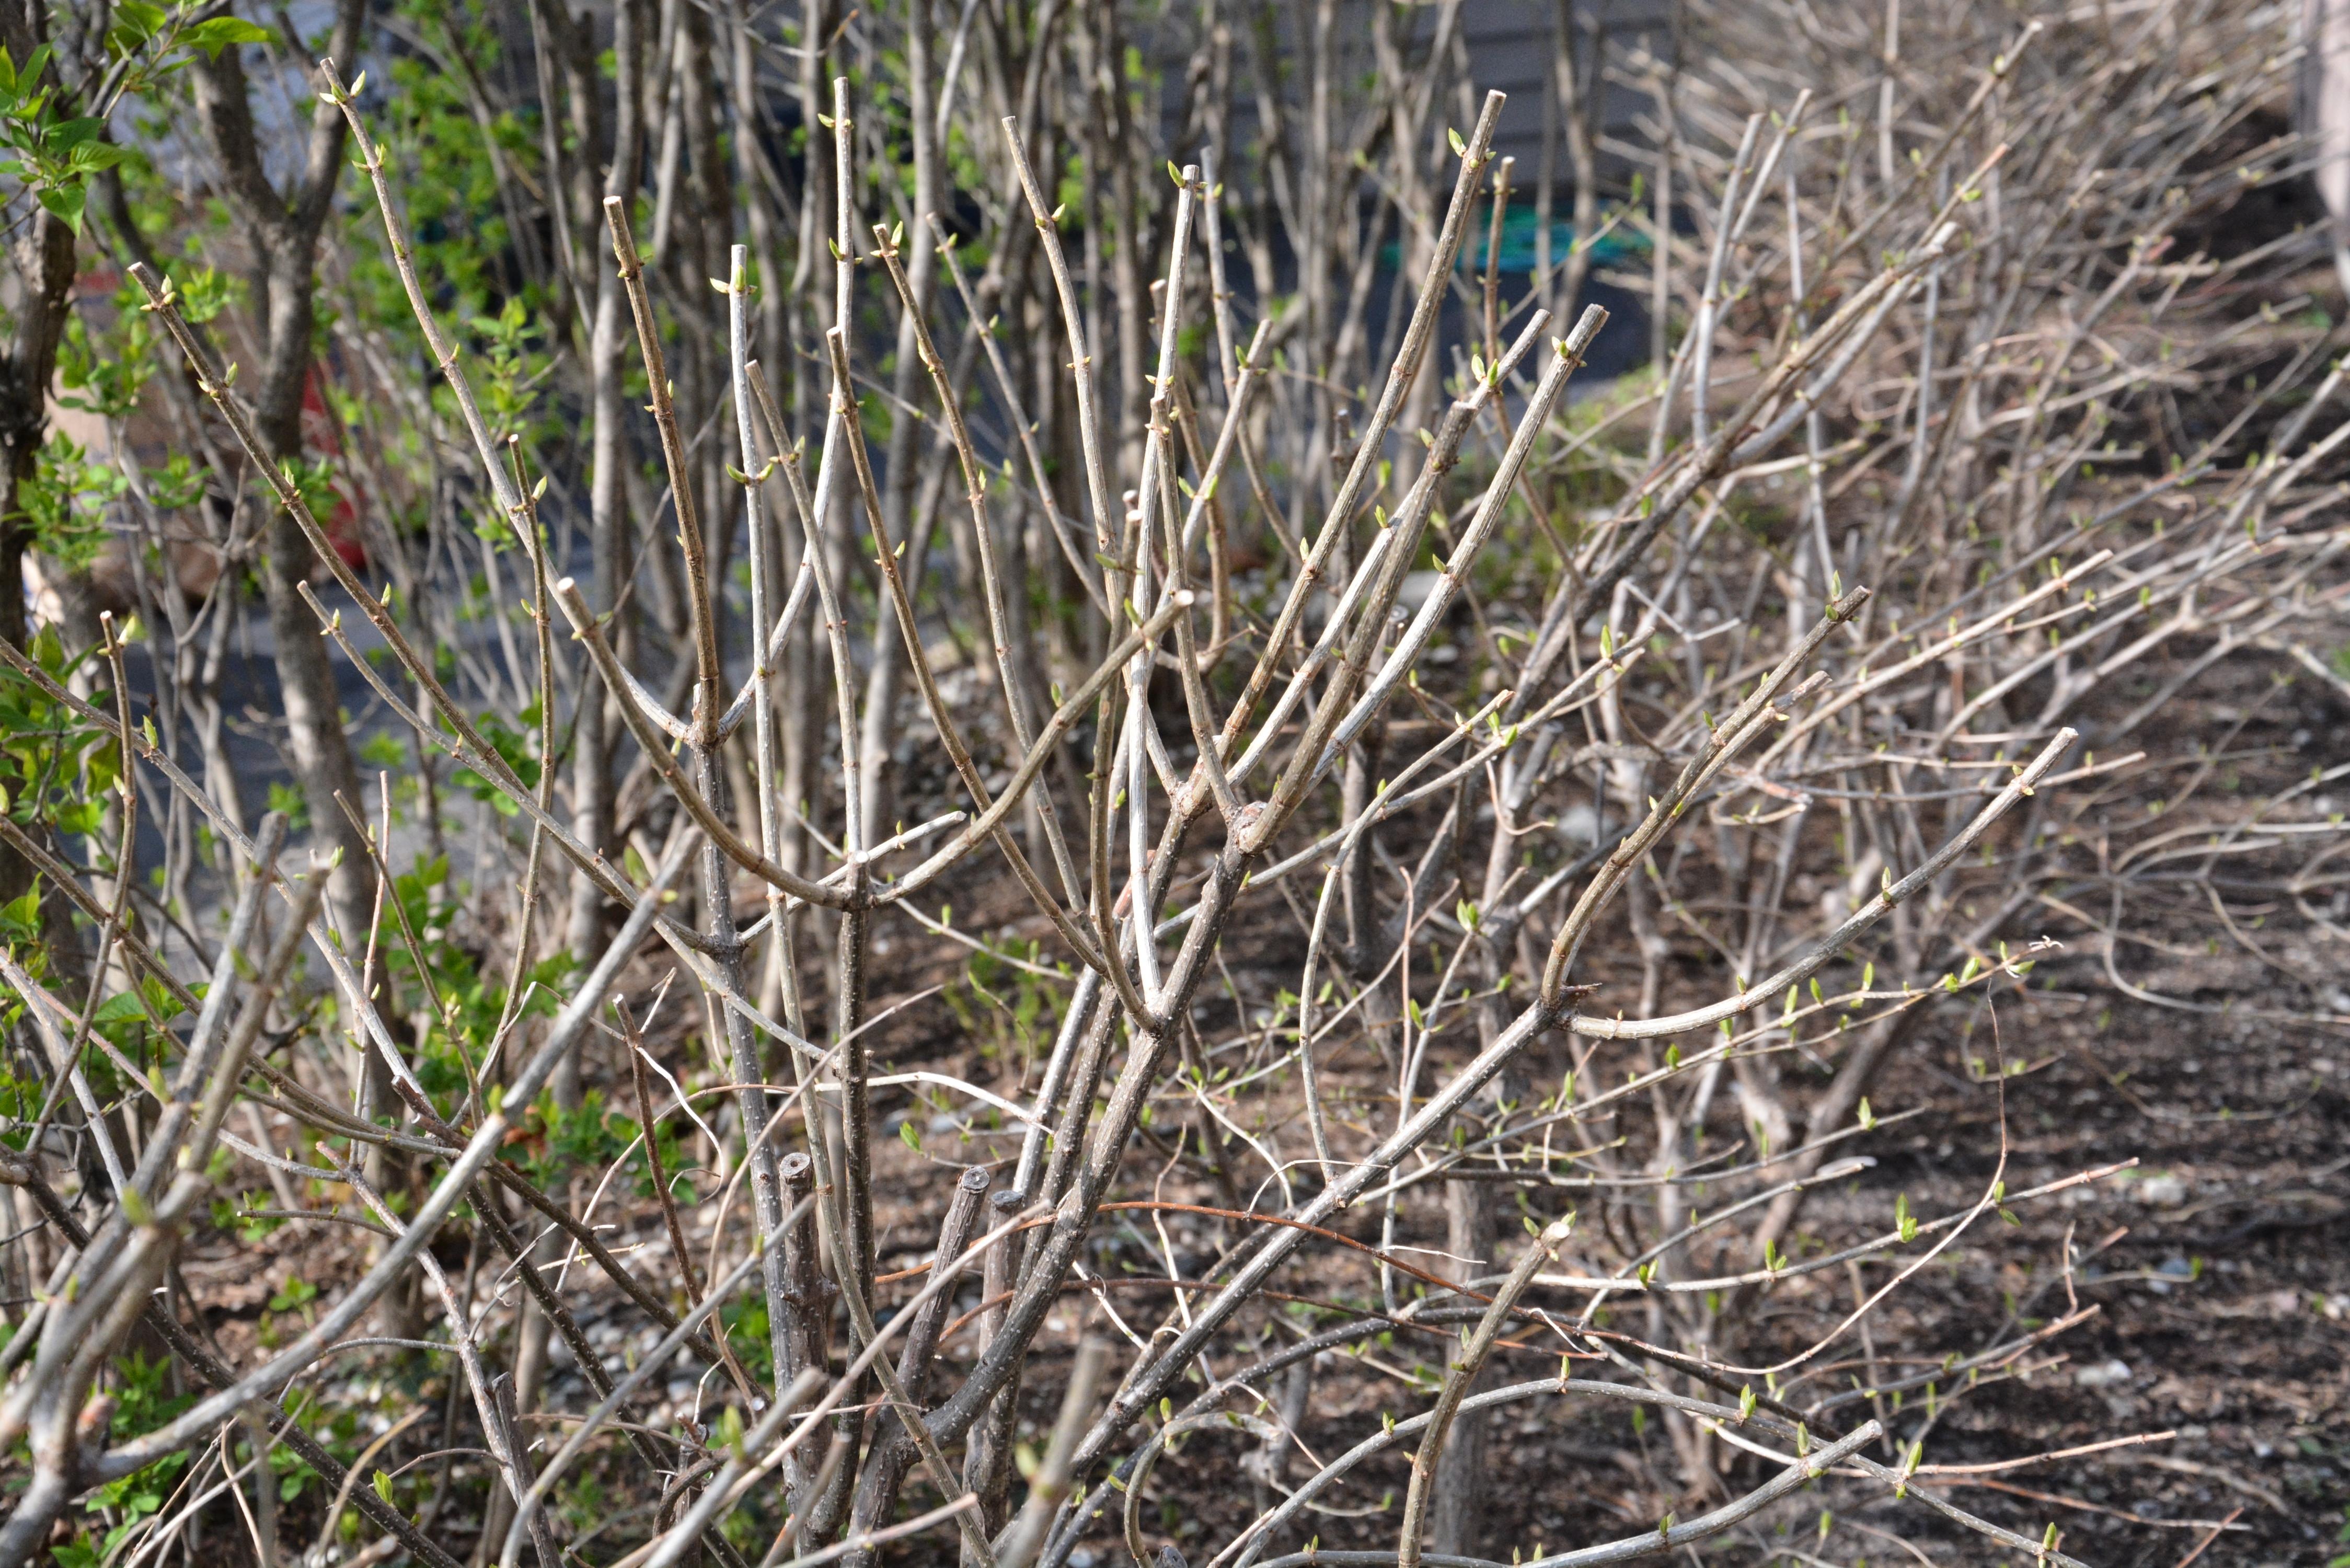 Potare ortensie - Hydrangea macrophylla - Potatura